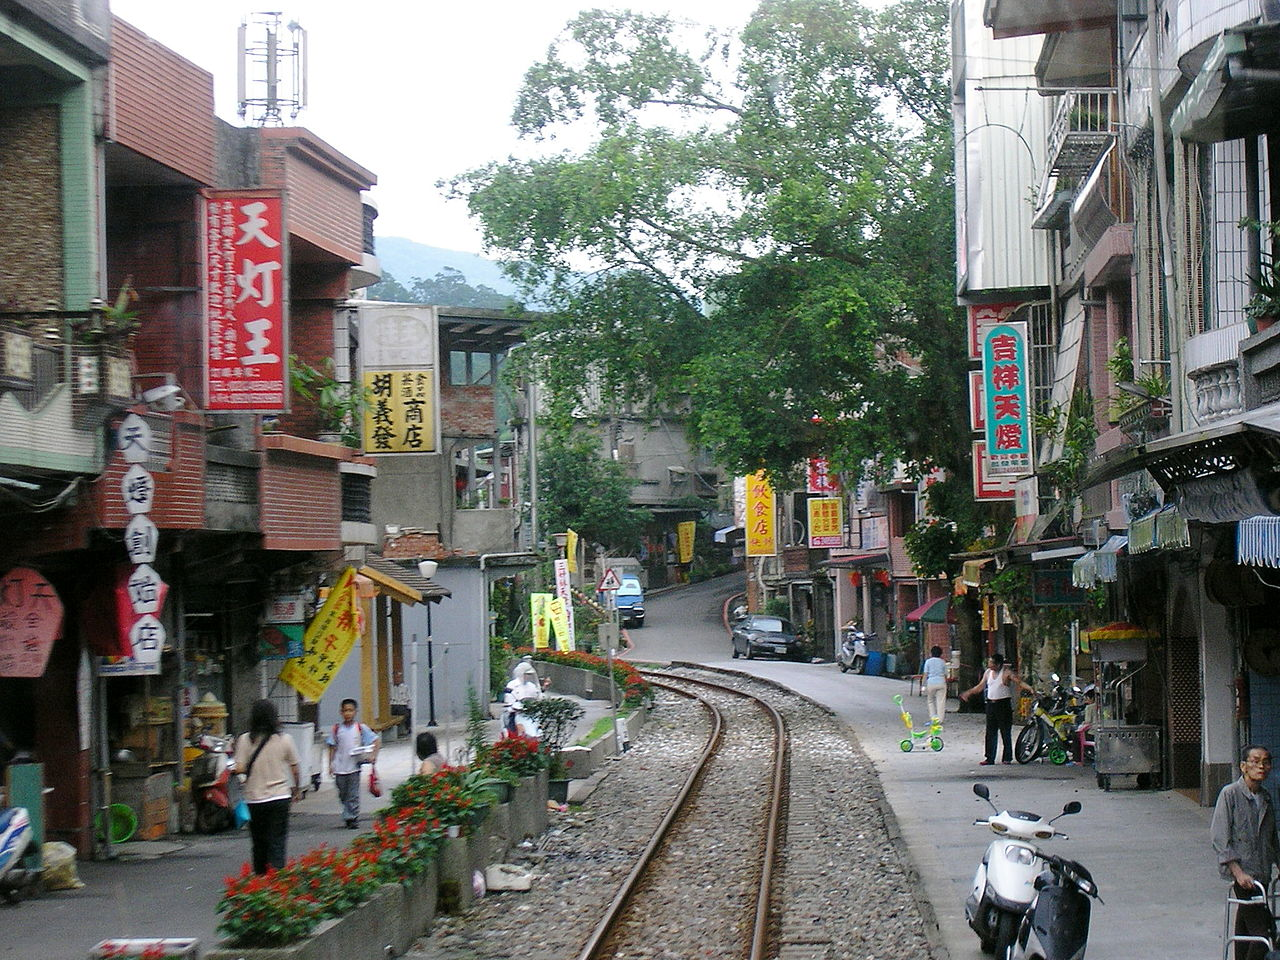 https://upload.wikimedia.org/wikipedia/commons/thumb/5/5f/TRA_Pingsi_Line_Shihfen.JPG/1280px-TRA_Pingsi_Line_Shihfen.JPG